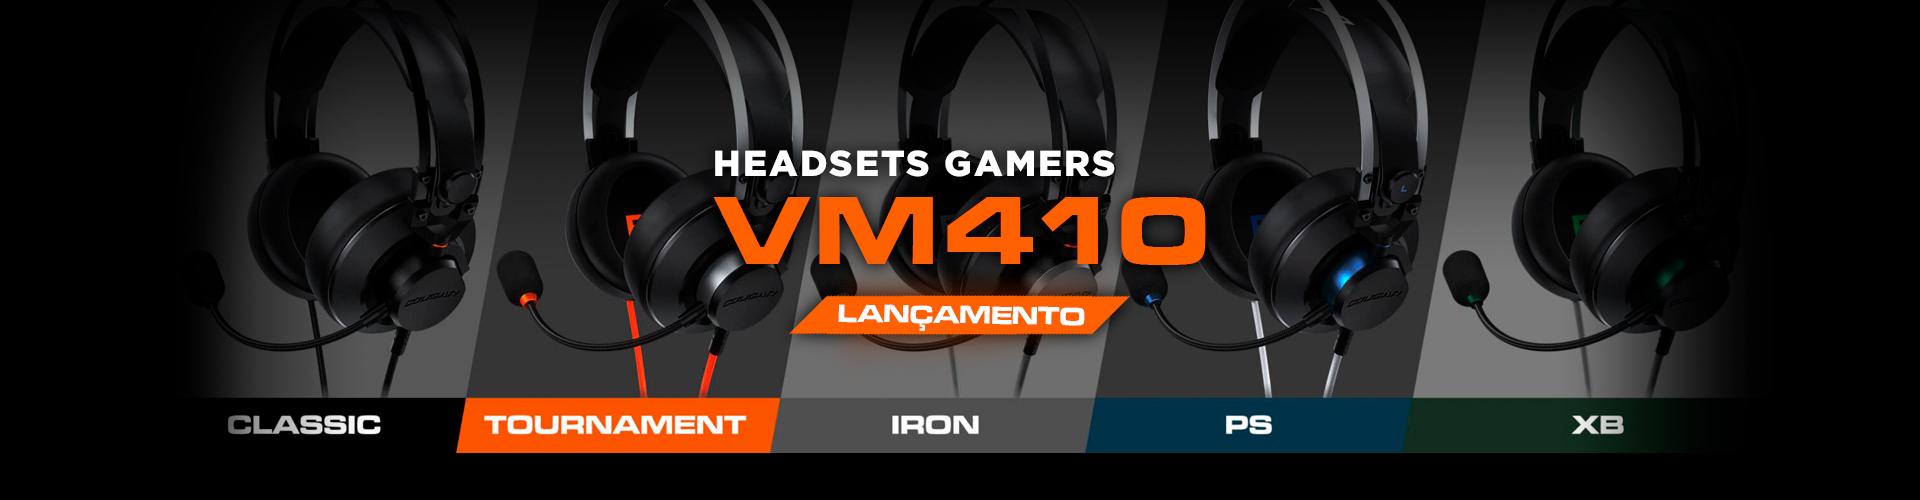 Novos Headset VM410